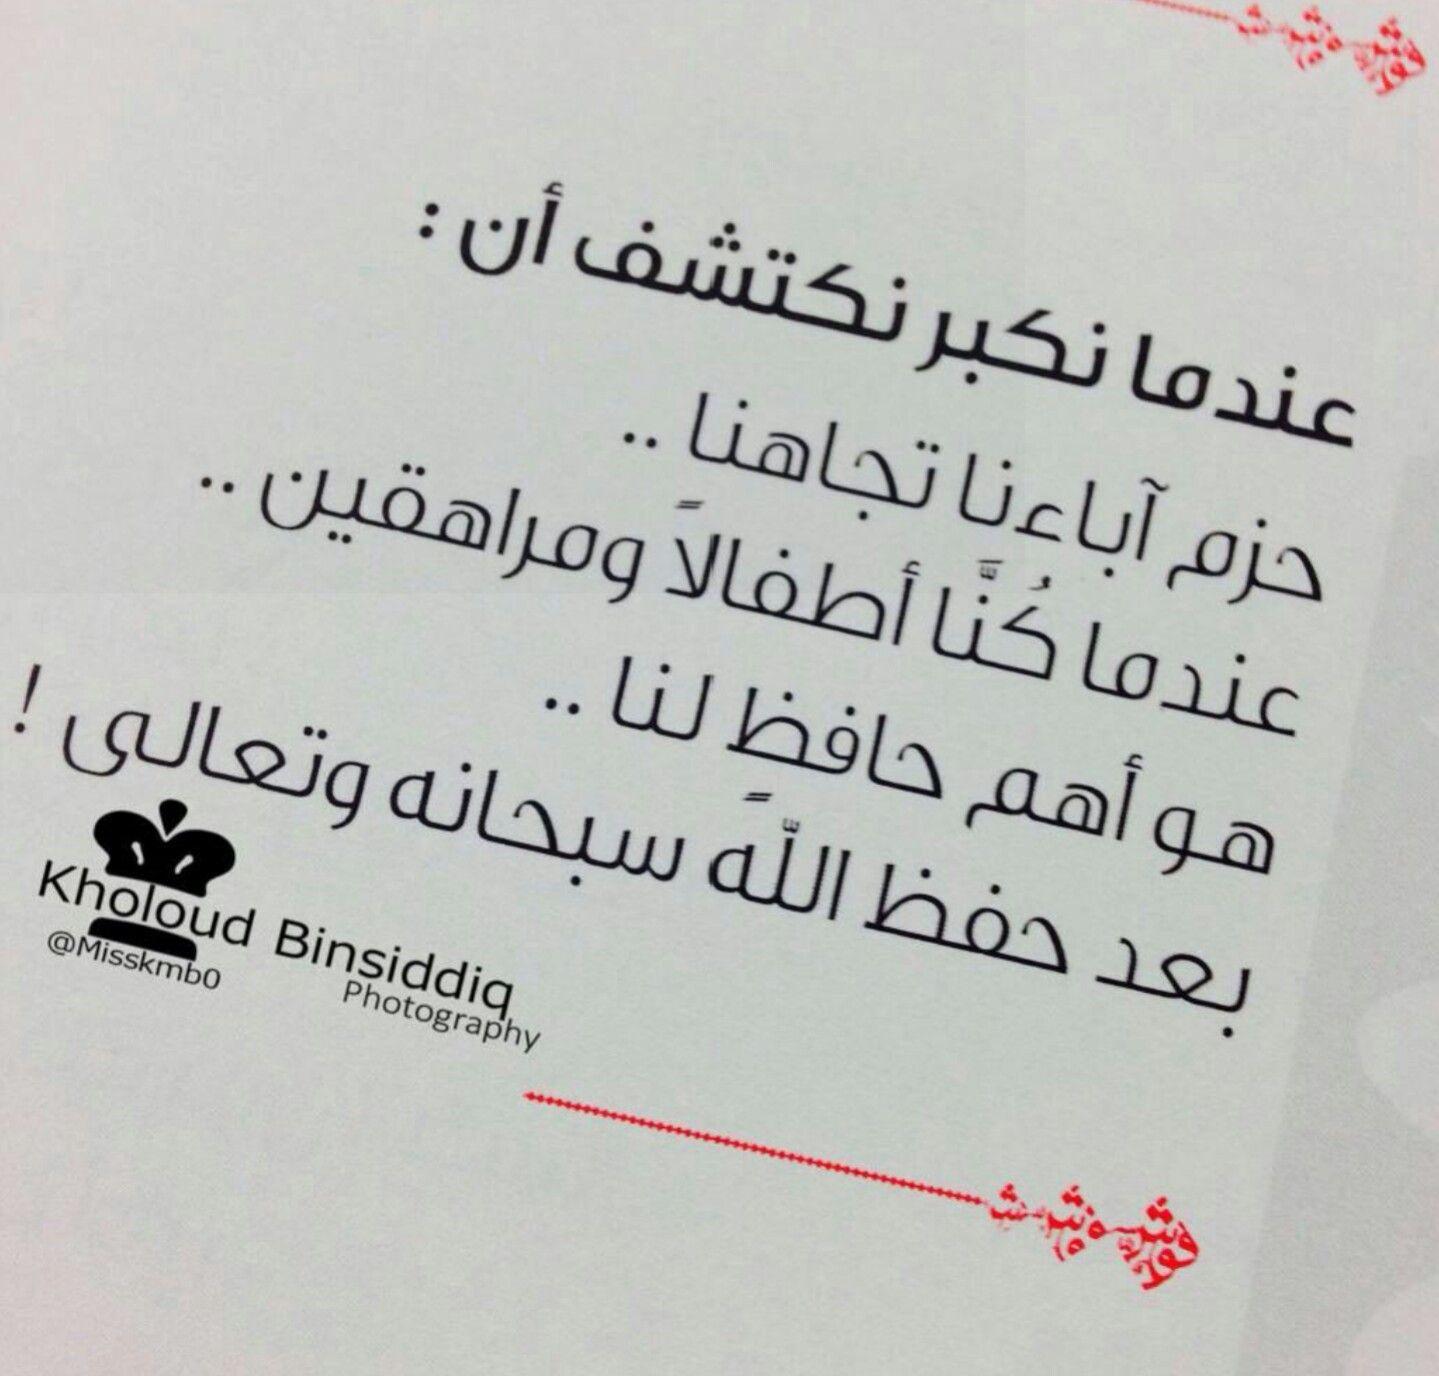 Pin By ث ہو ڑ ۃ ے On بريق الحروف Math Arabic Calligraphy Math Equations